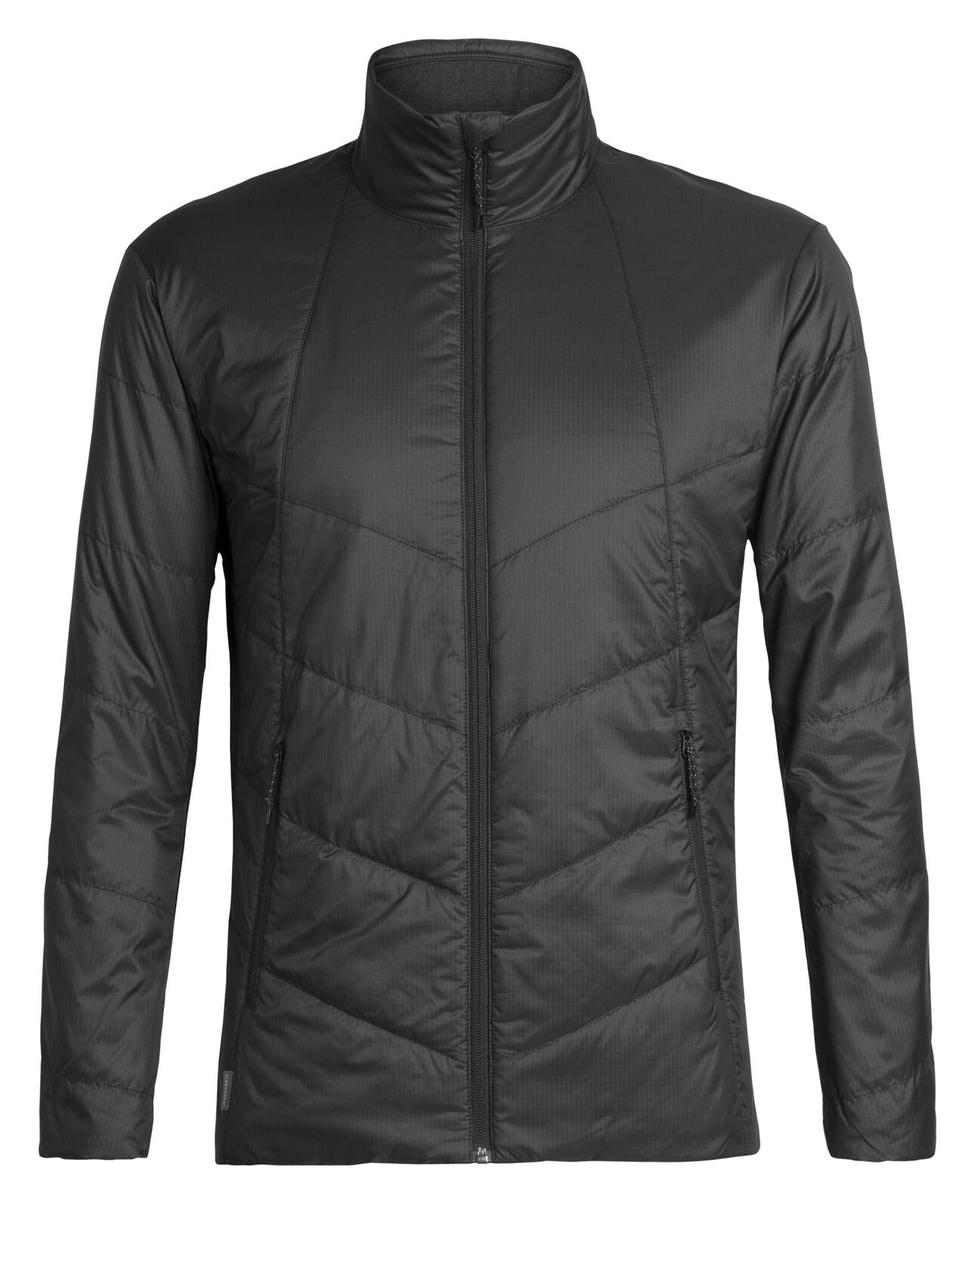 Куртка мужская Icebreaker Helix Jacket